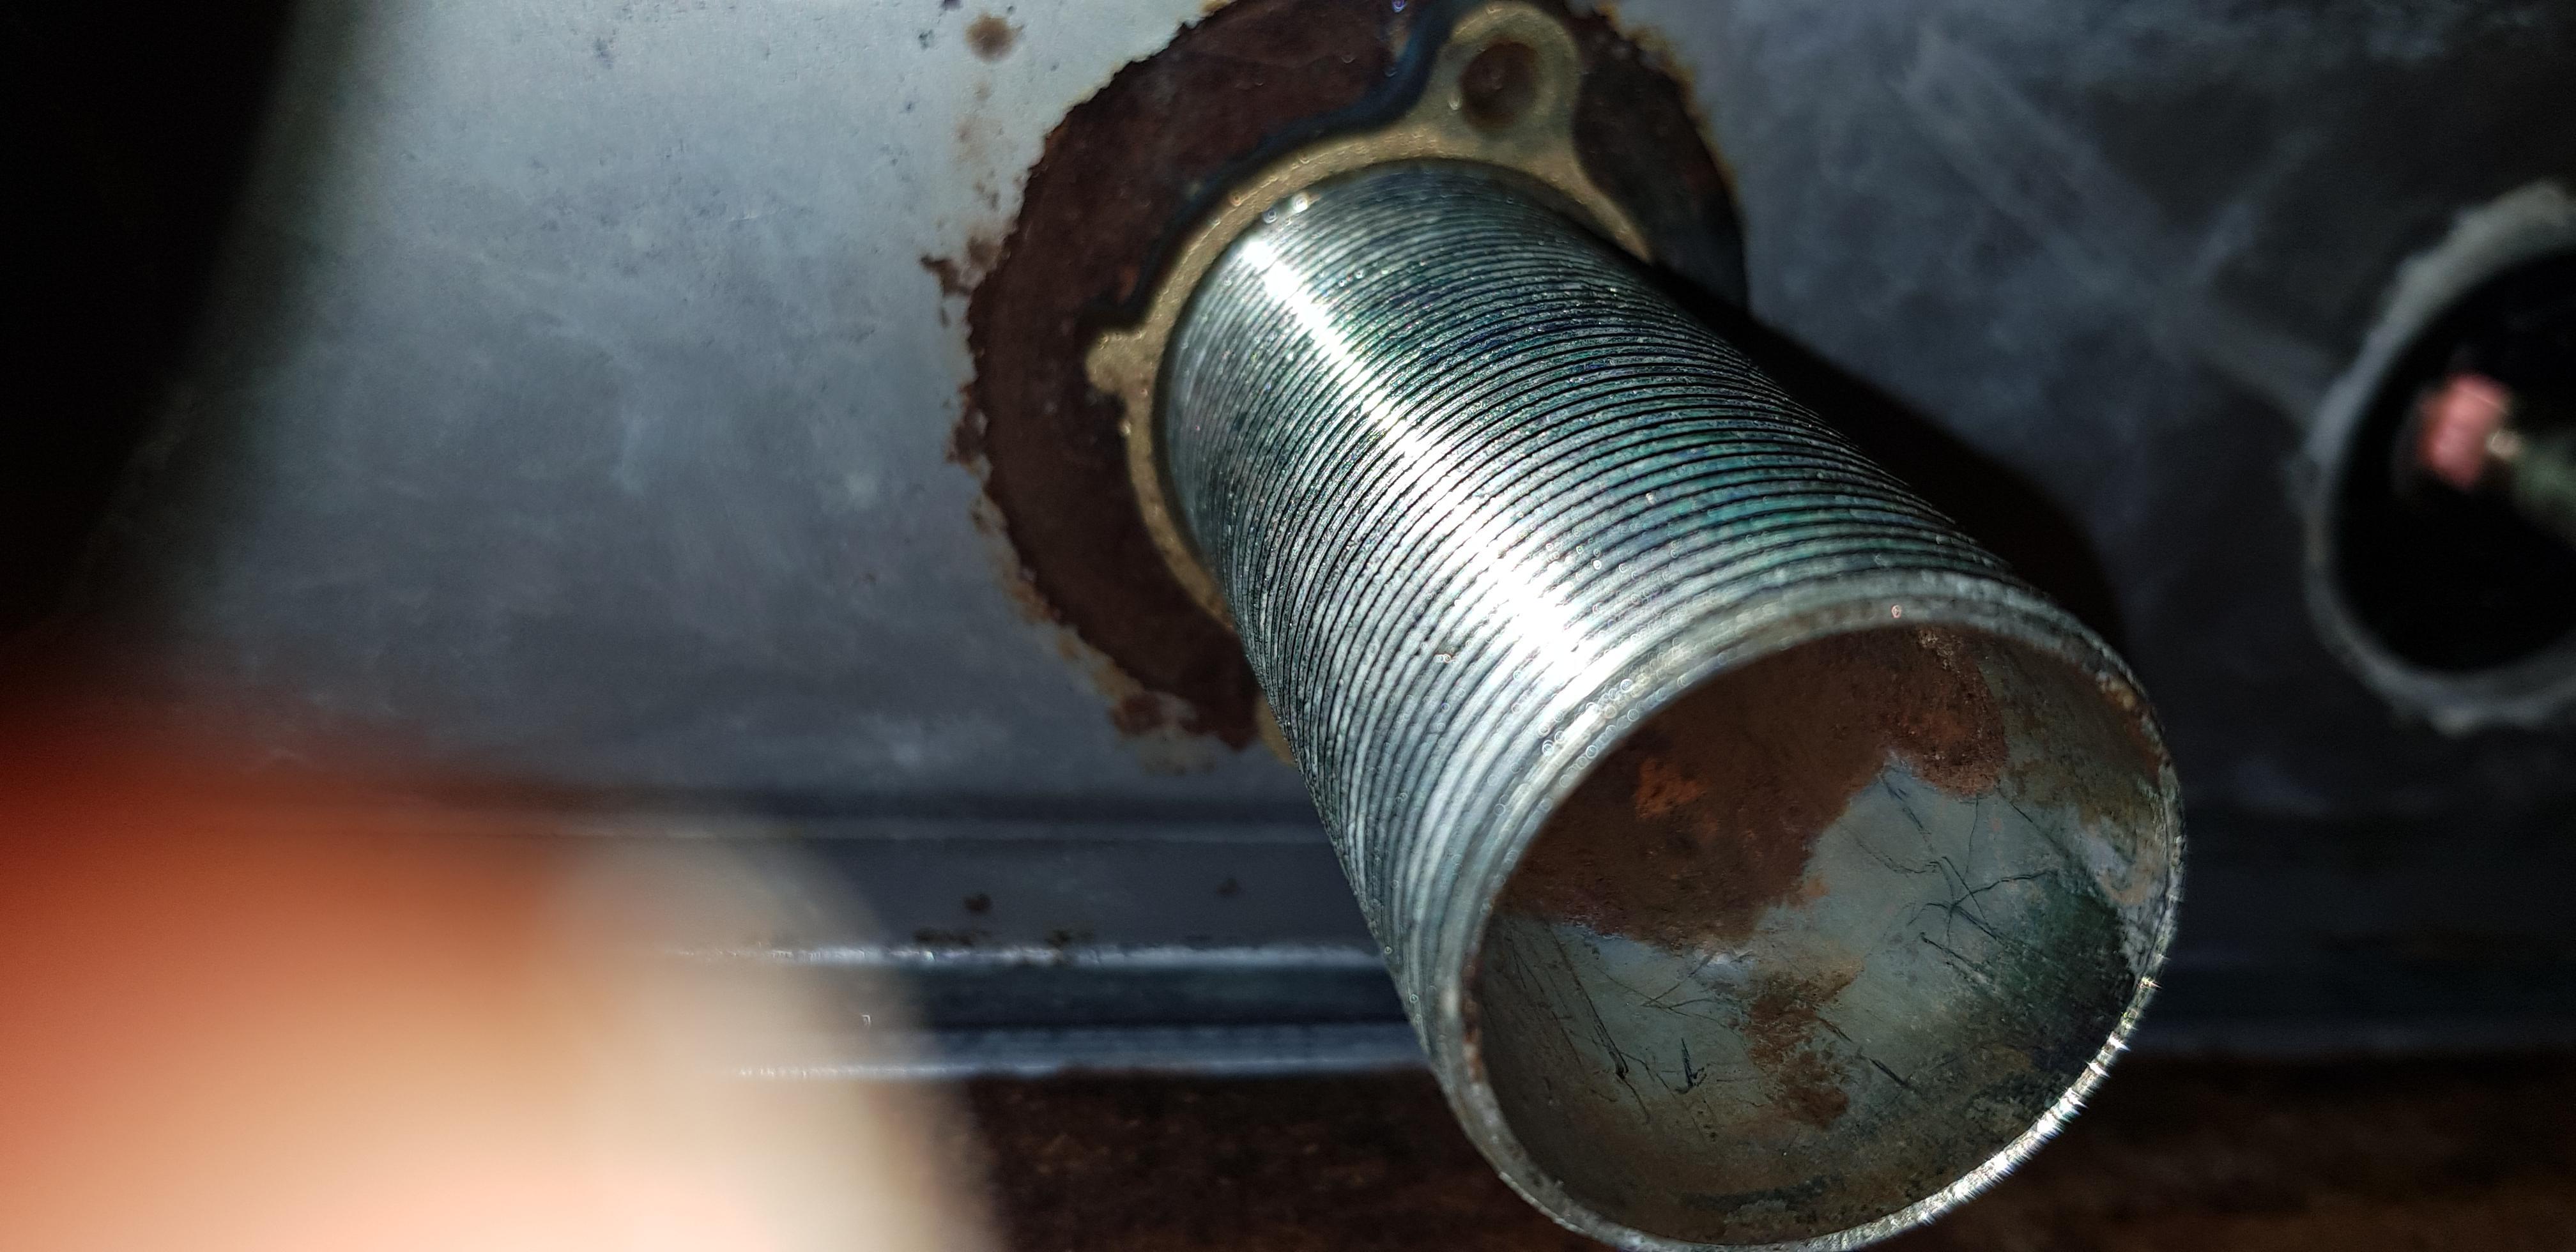 how do i remove a stuck faucet lock nut